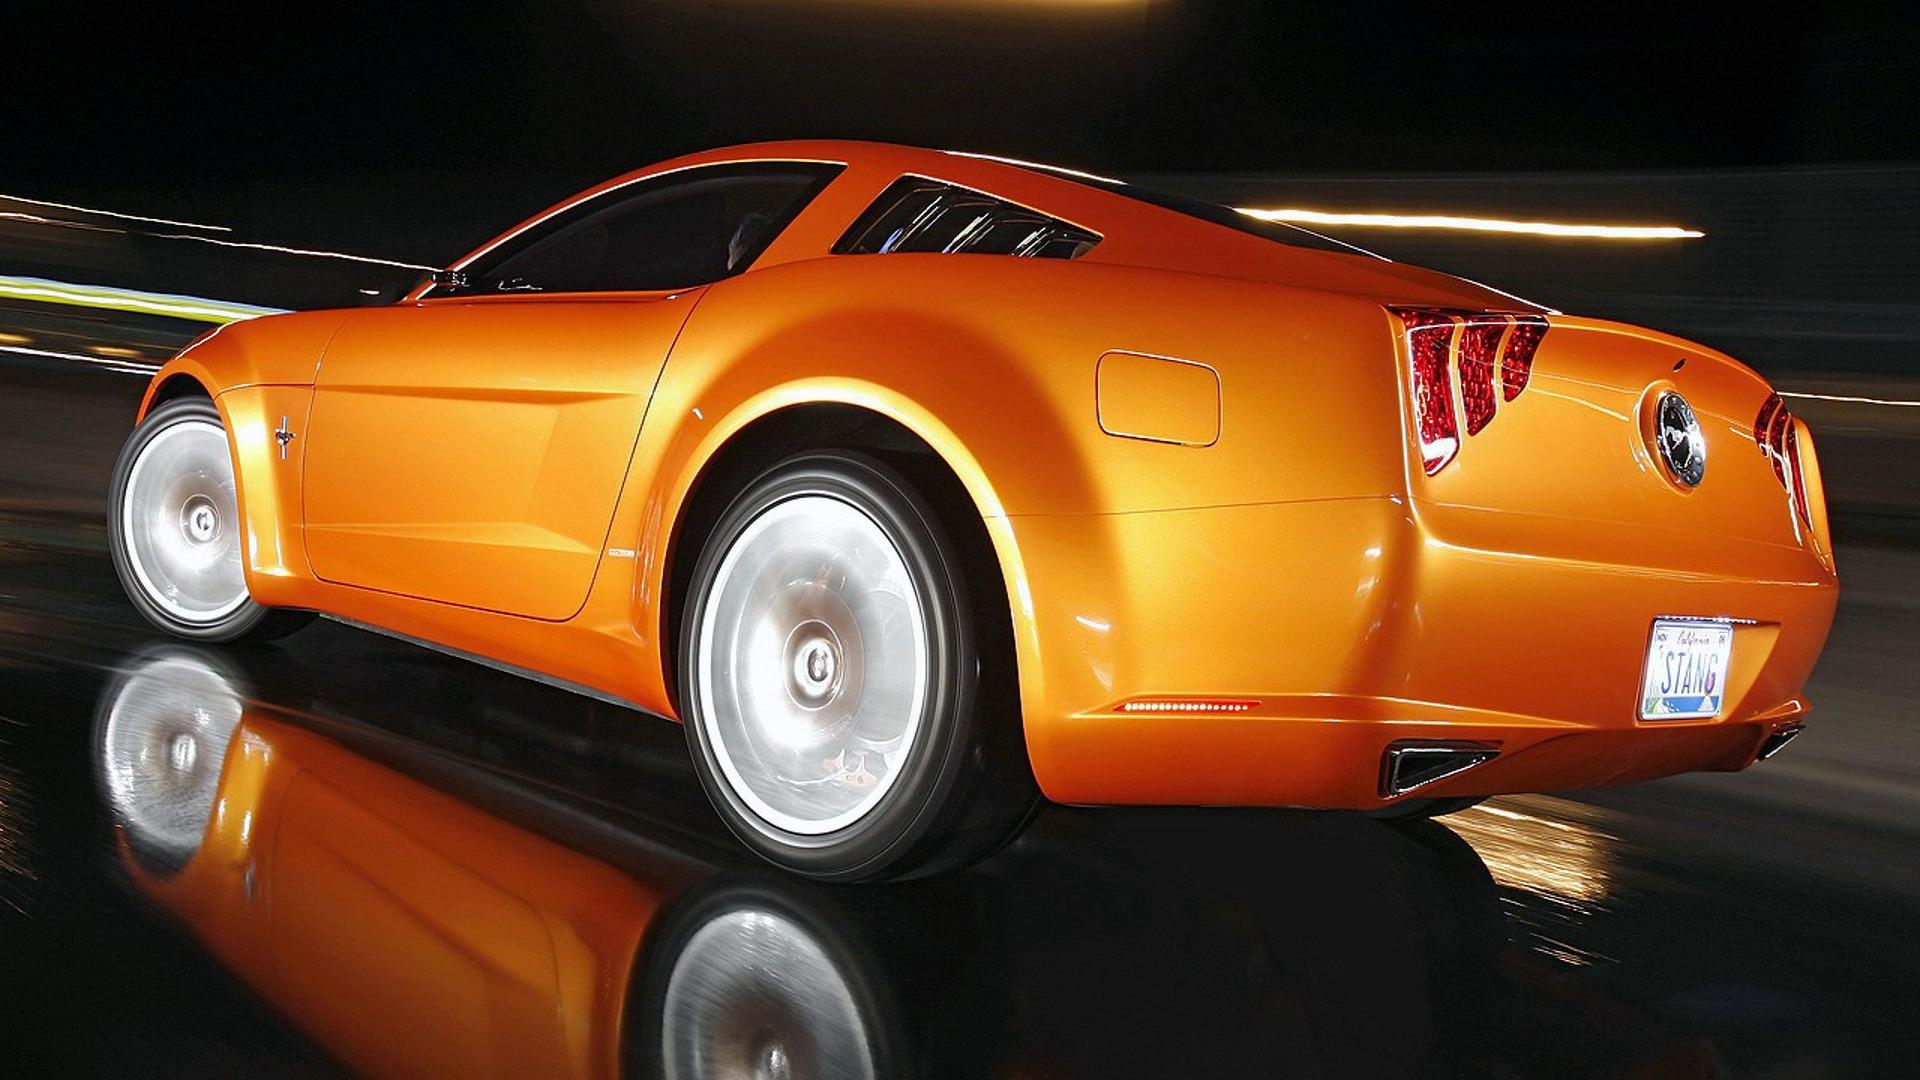 2006-ford-mustang-giugiaro-concept (19)